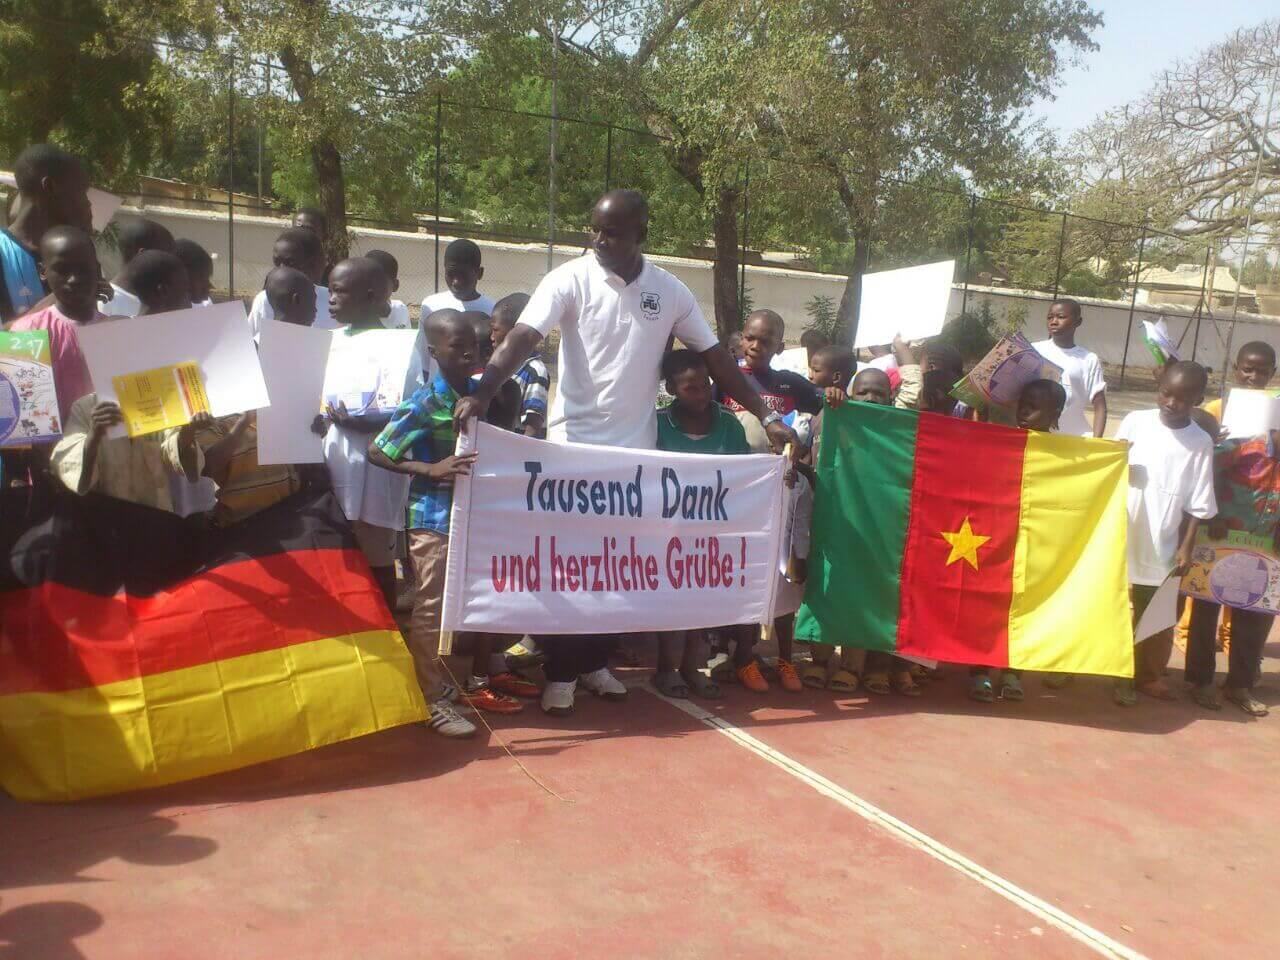 Tennisschläger für Kamerun 02